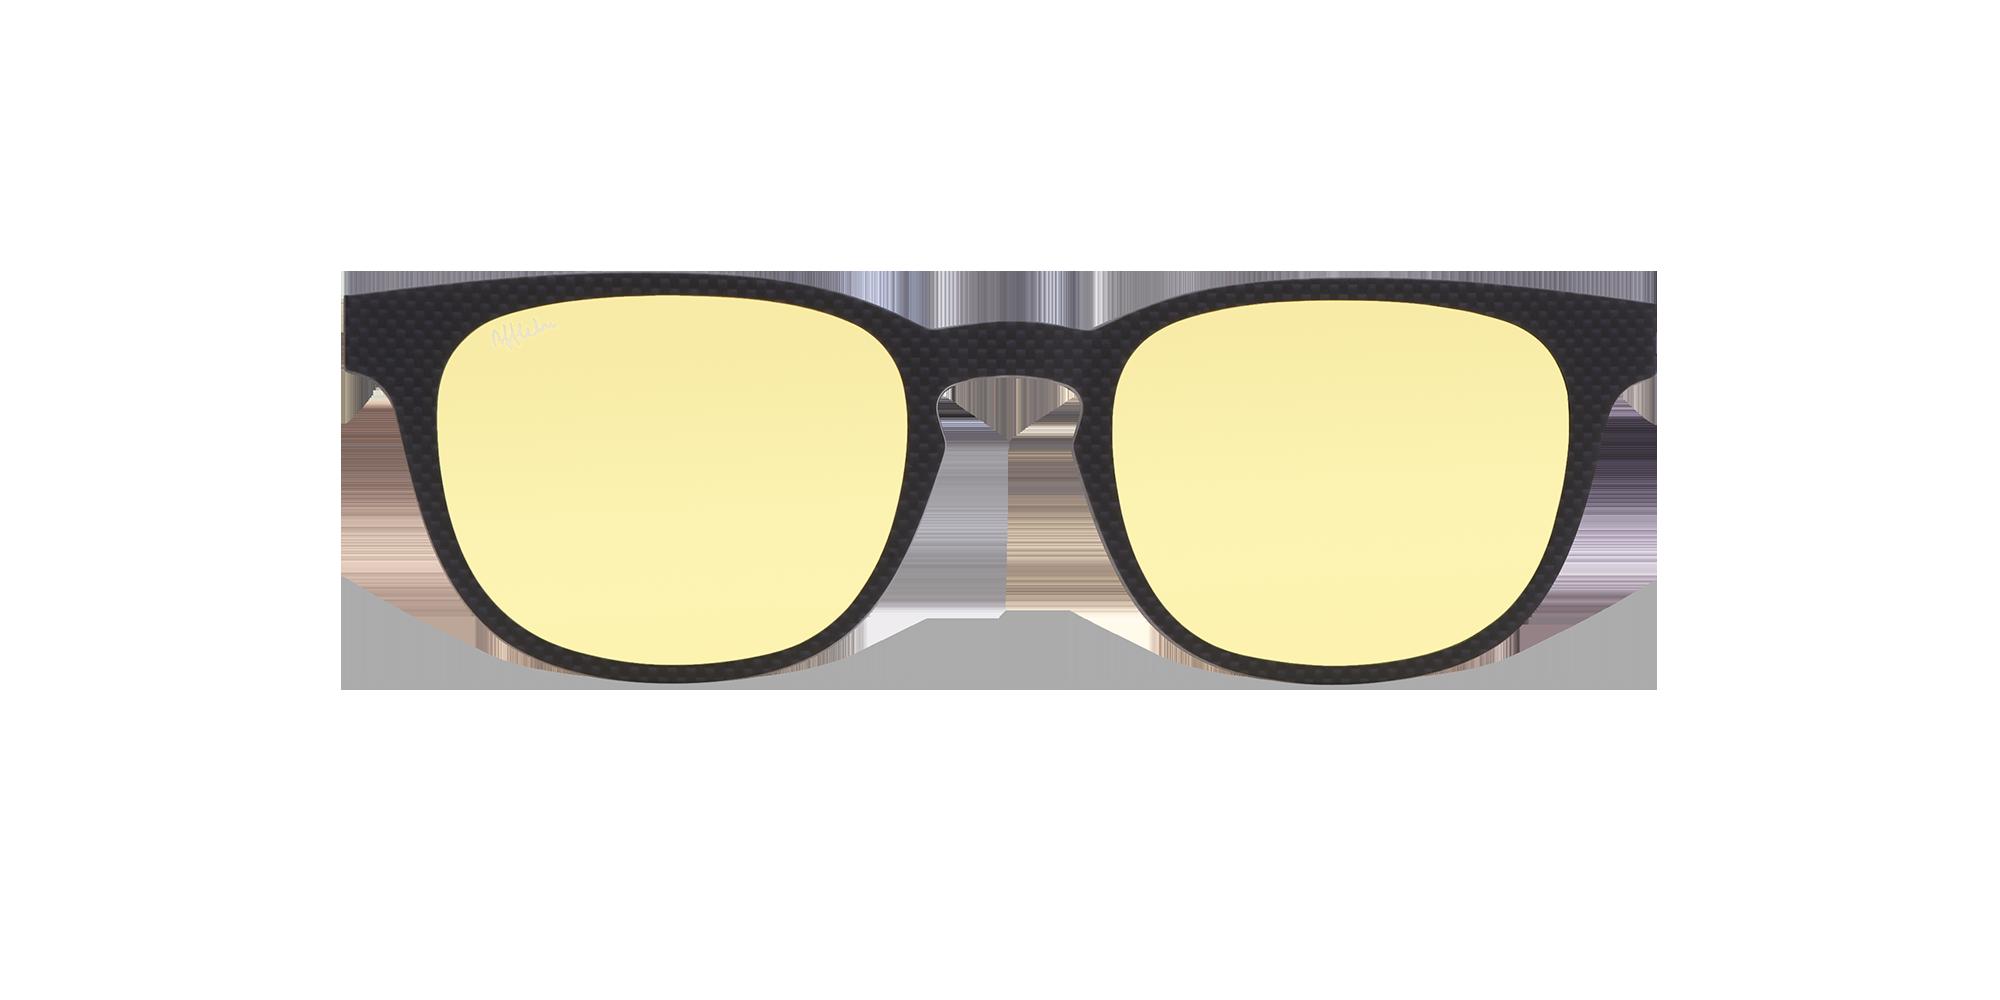 afflelou/france/products/smart_clip/clips_glasses/TMK33YEBK015120.png